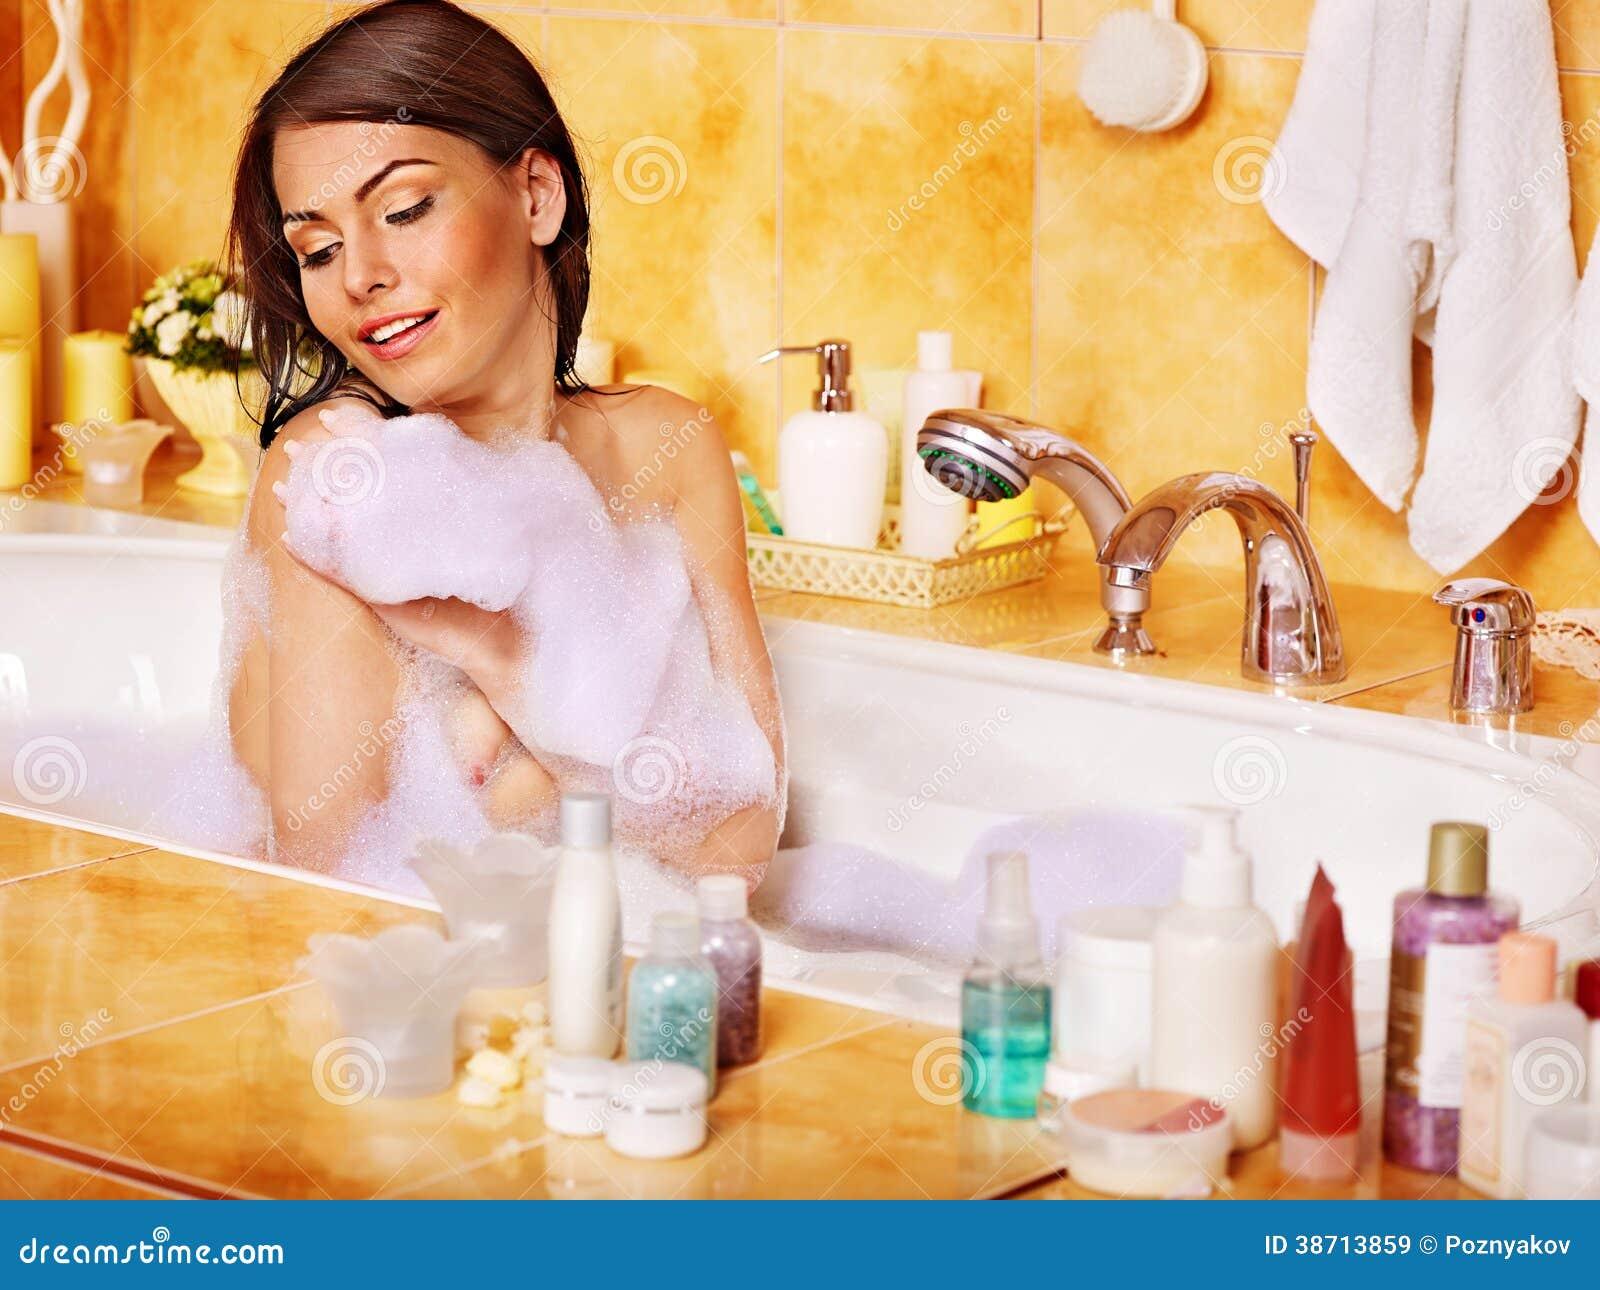 Imagenes Que Indiquen Baño De Mujeres:Relaxing Bubble Bath Woman